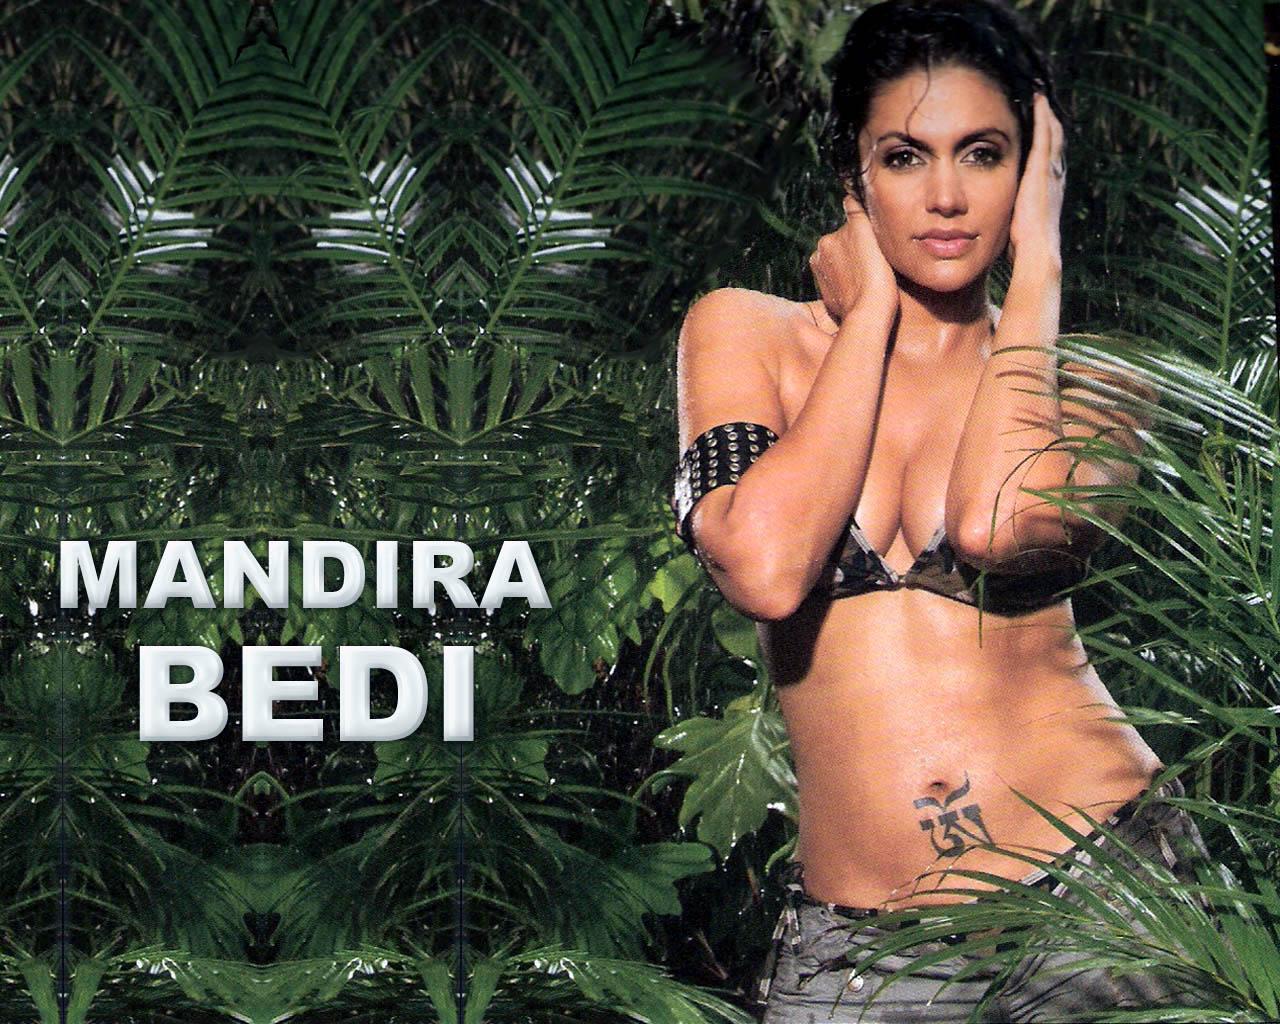 mandira-bedi-sex-free-download-teen-topsex-pic